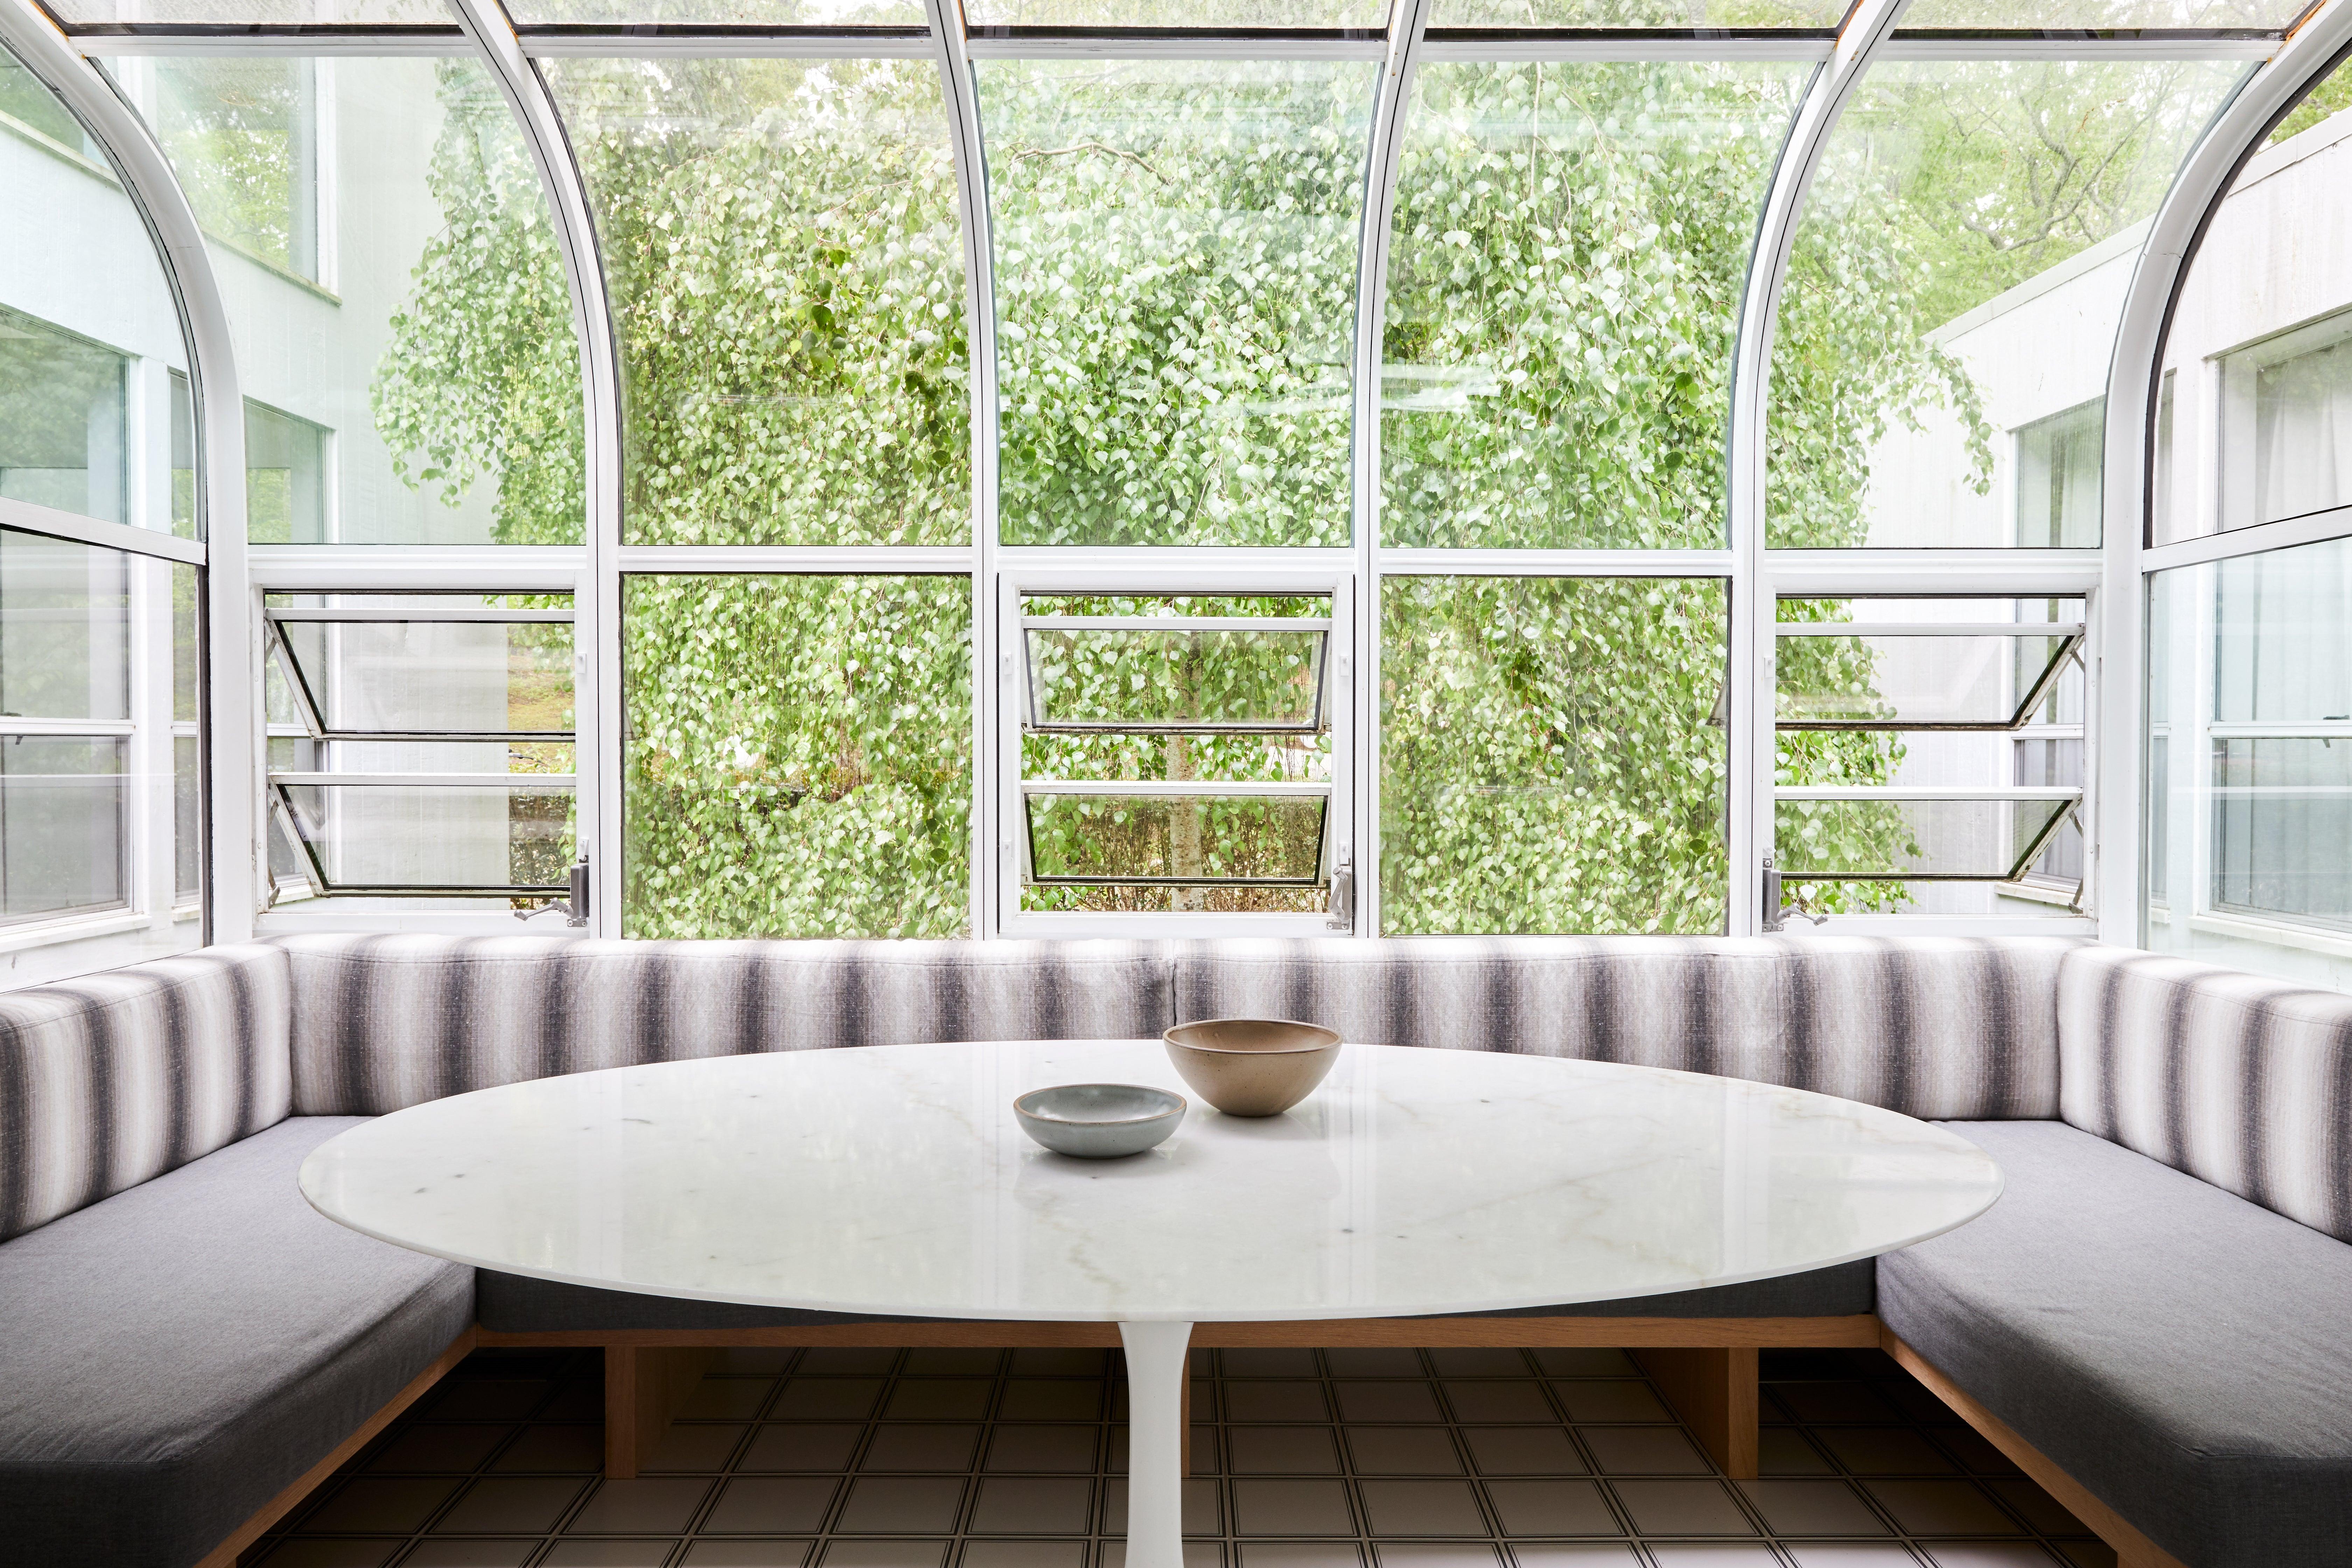 DOM_JPL_East_Hampton_Dining_Room_001